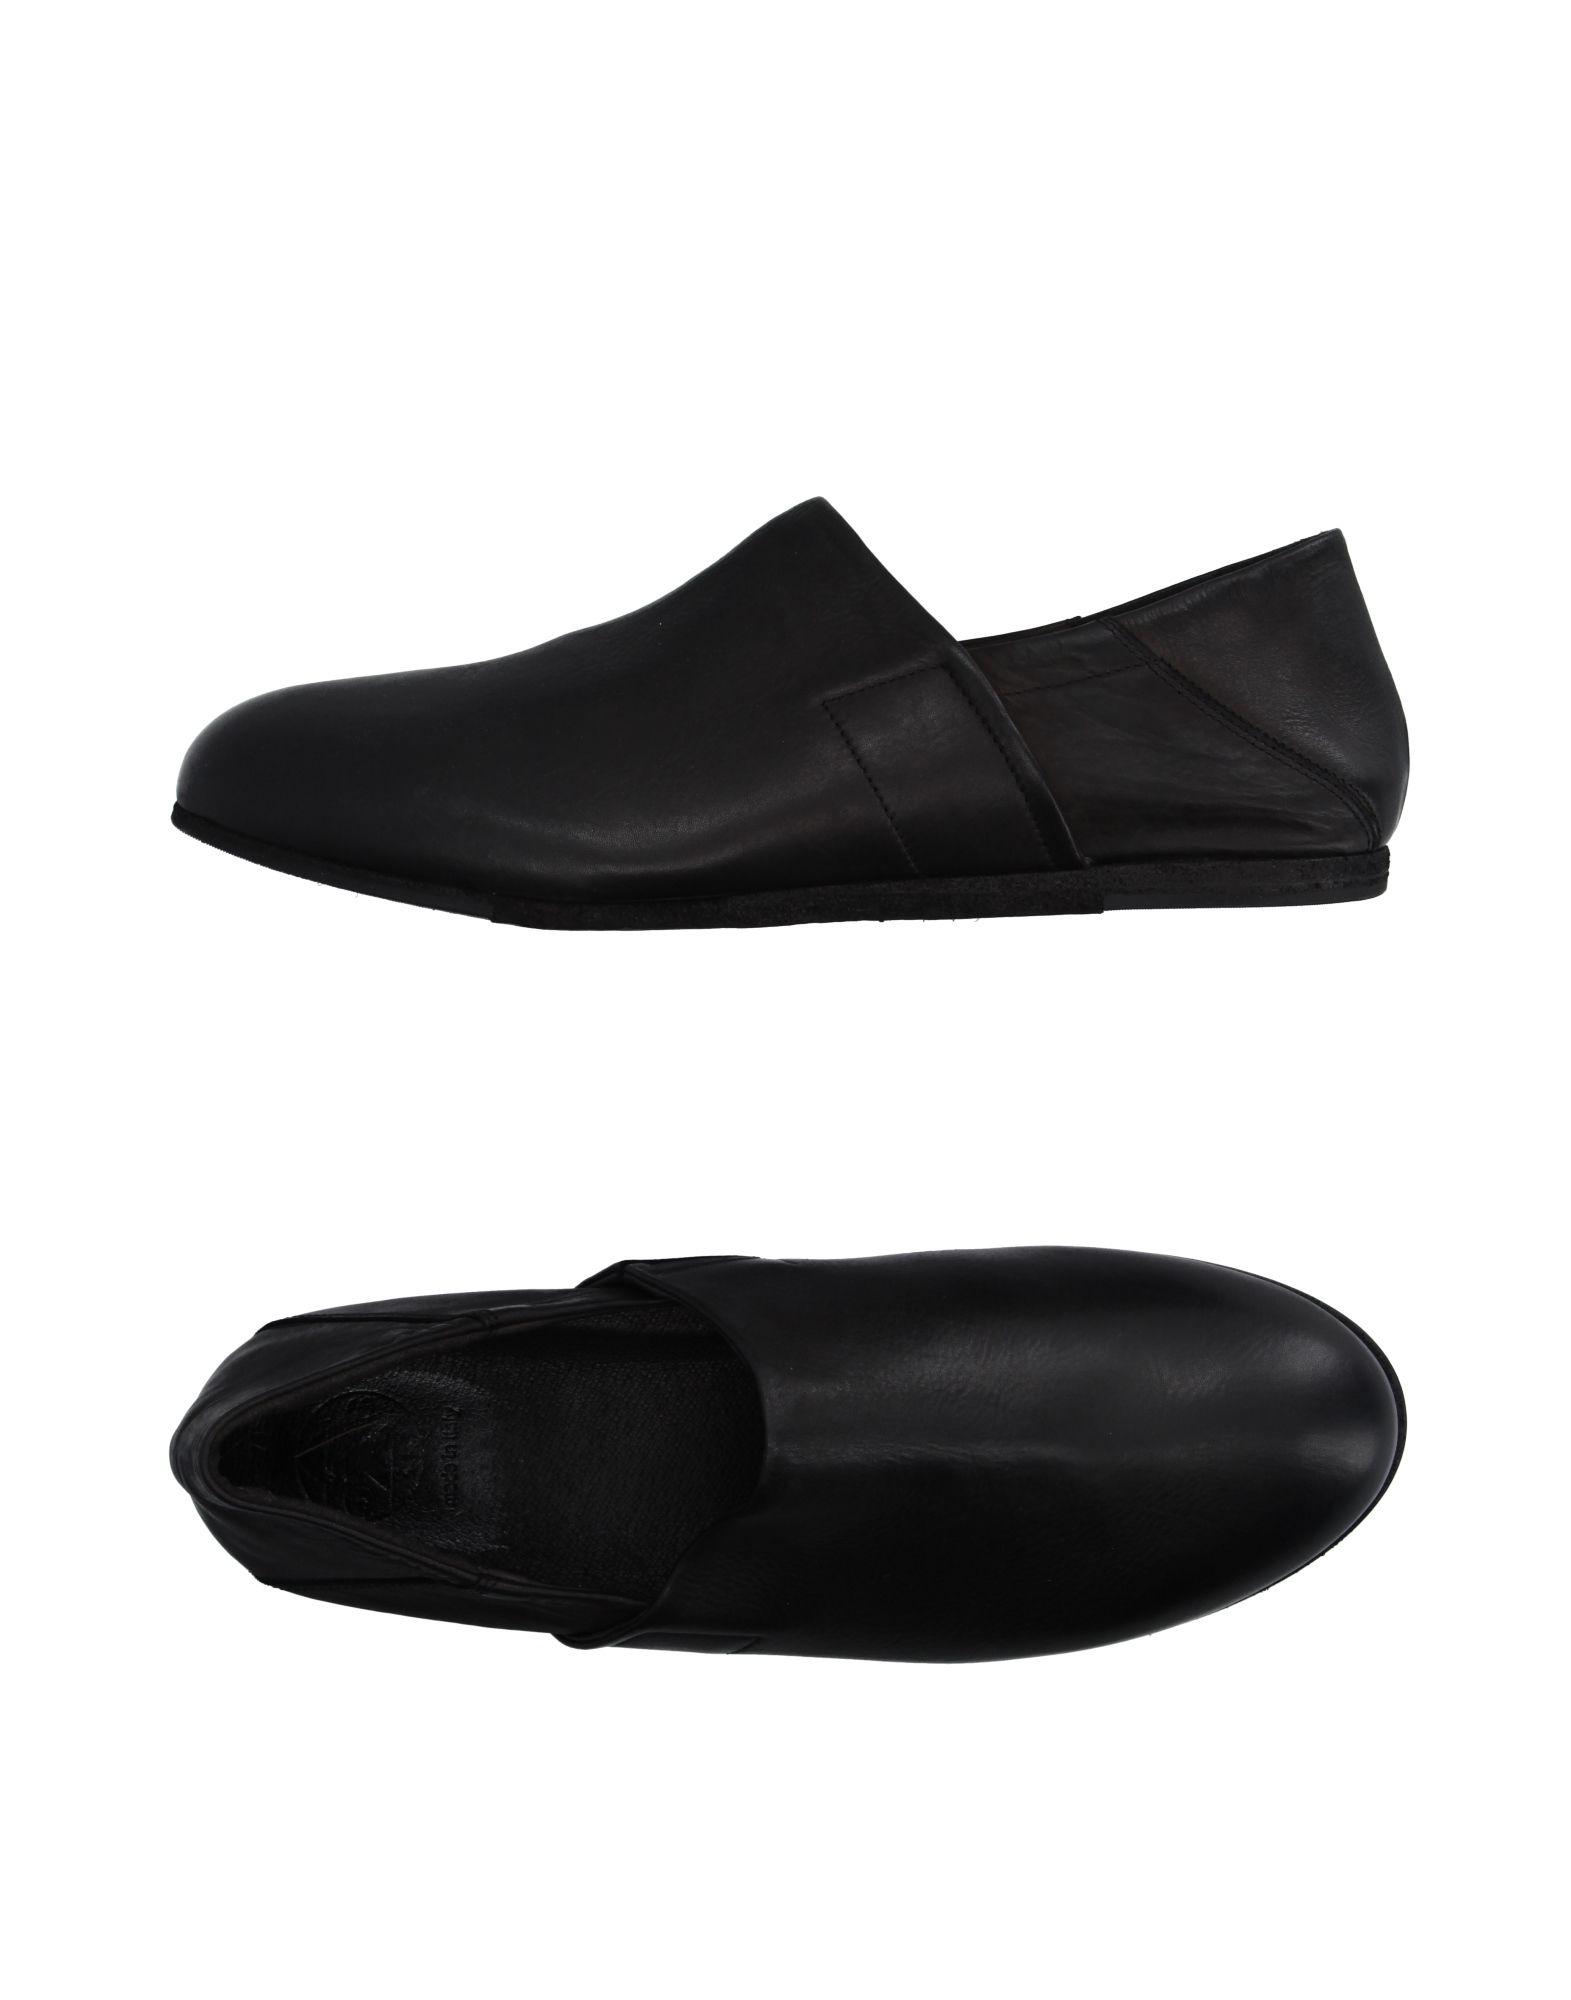 O.X.S. Sneakers United - Men O.X.S. Sneakers online on  United Sneakers Kingdom - 11118496JU 8b6393